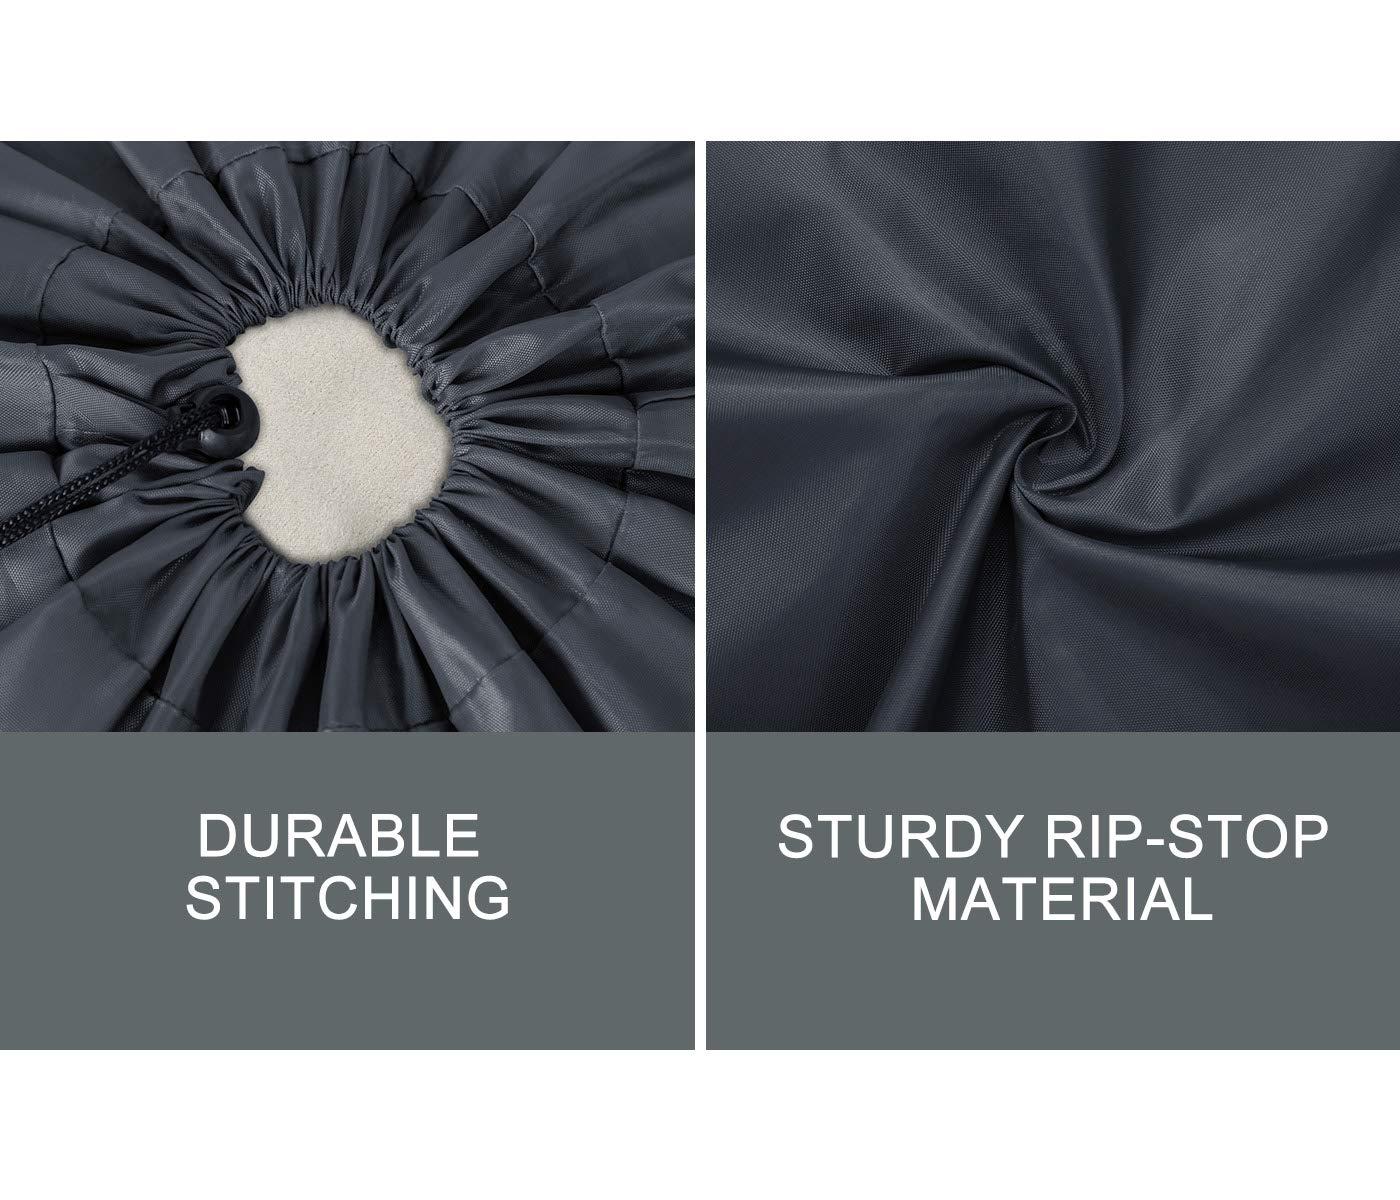 ZERO JET LAG 2 Pack Extra Large Travel Laundry Bag Set Nylon Rip-Stop Dirty Storage Bag Machine Washable Drawstring Closure 24'' x 36'' (Blue and Gray) by ZERO JET LAG (Image #4)